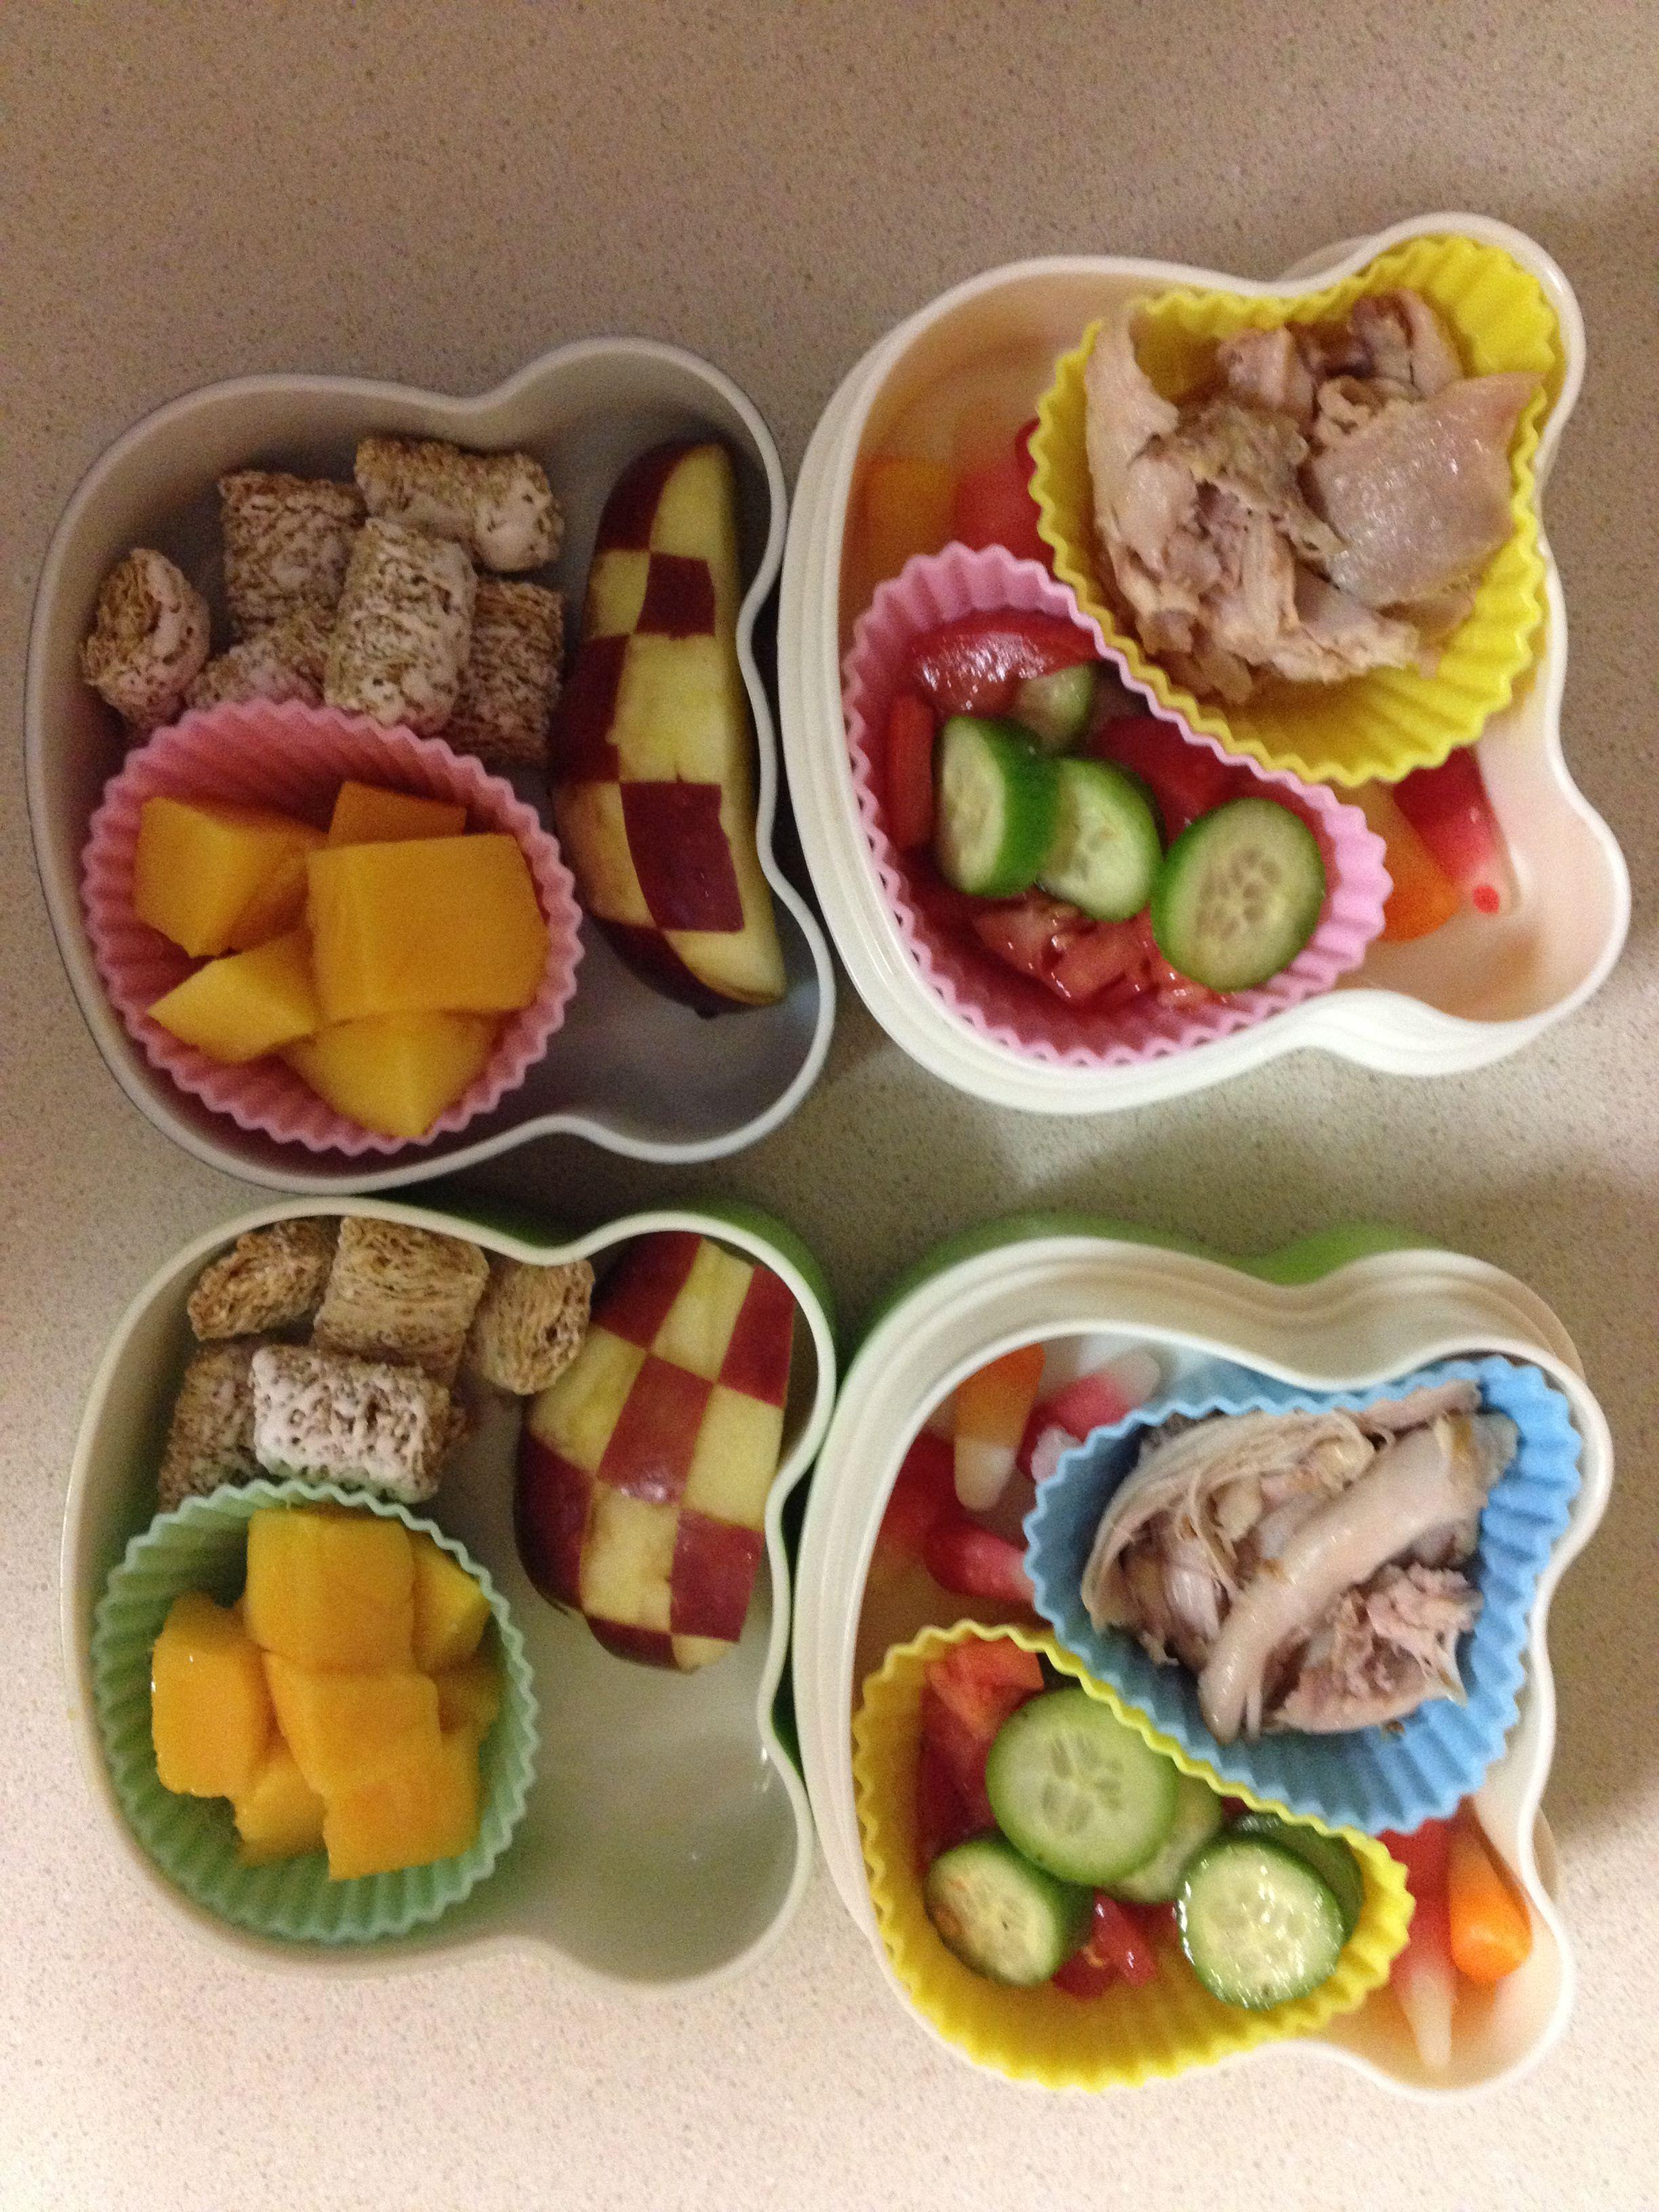 Bento with turkey, tomato/cucumber salad, checkerboard apple, mango, shredded wheat